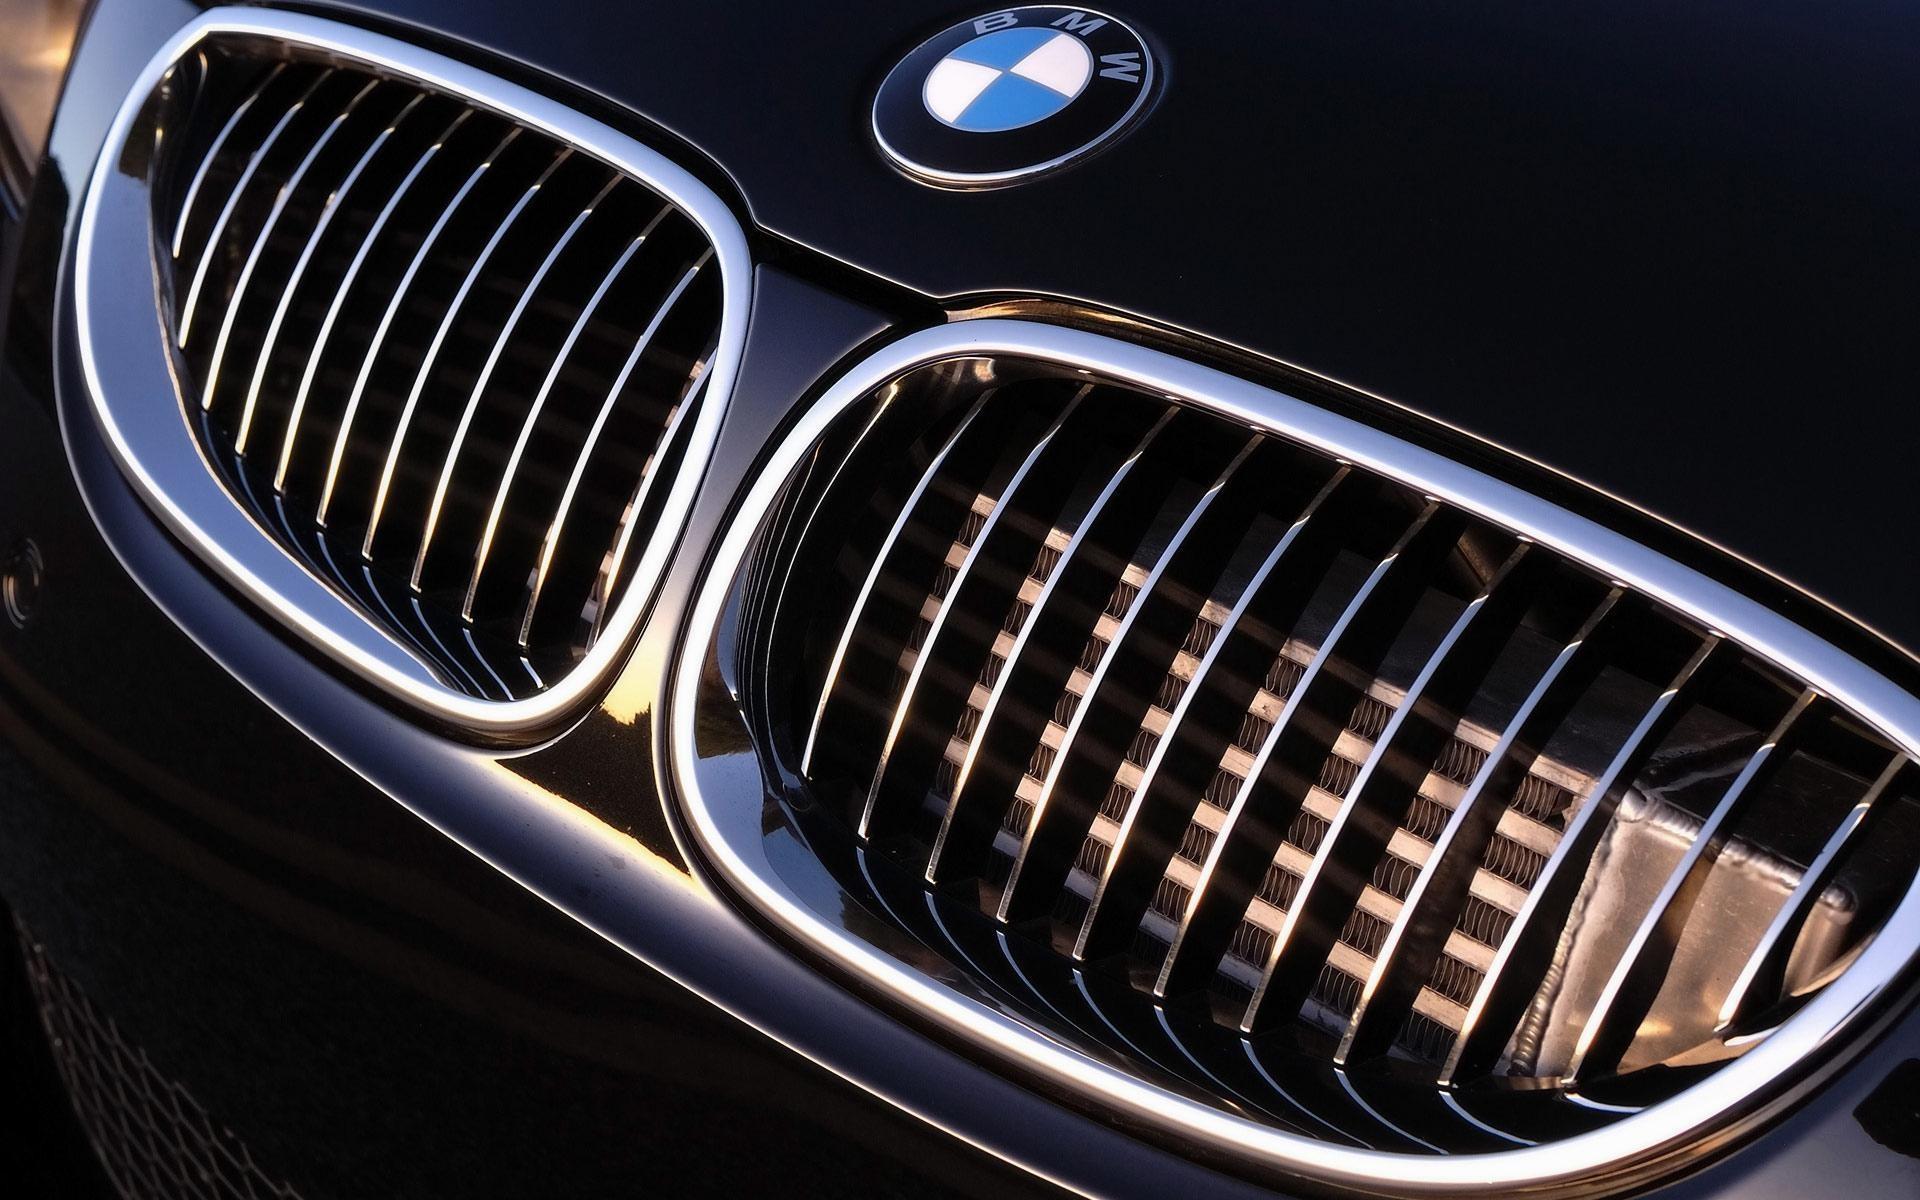 wallpaper.wiki-BMW-Logo-Background-Free-Download-PIC-